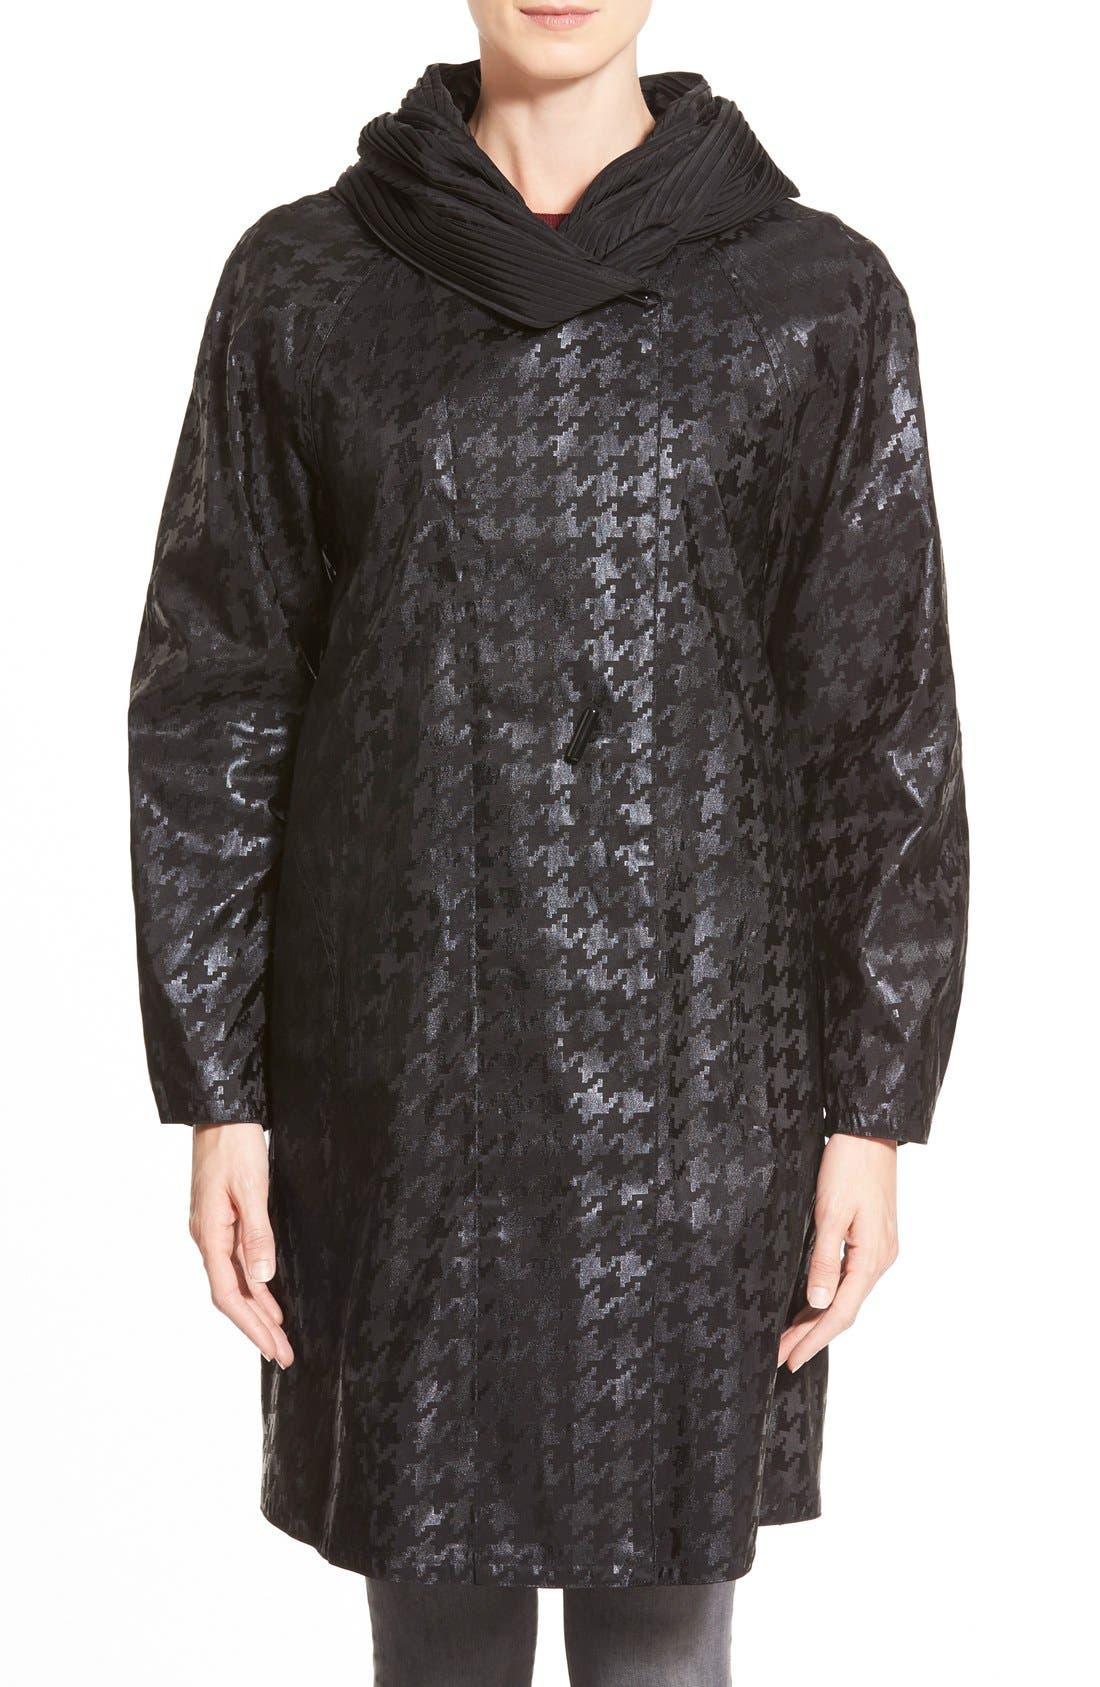 Main Image - MycraPac DesignerWear 'ShortDonatella' Reversible Pleat Hood PackableTravel Coat